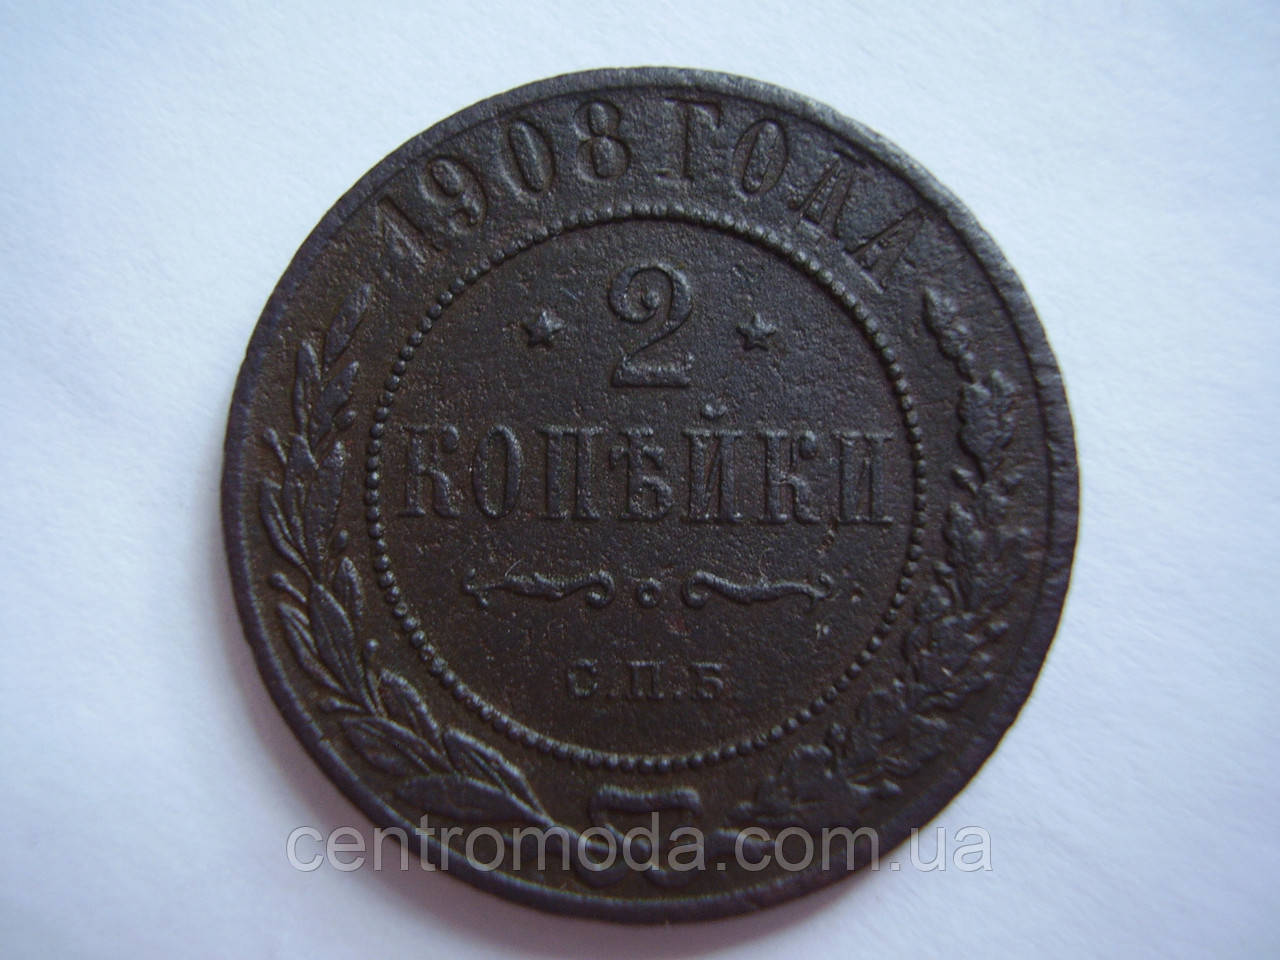 2 копейки 1908 цена тираж юбилейных монет казахстана